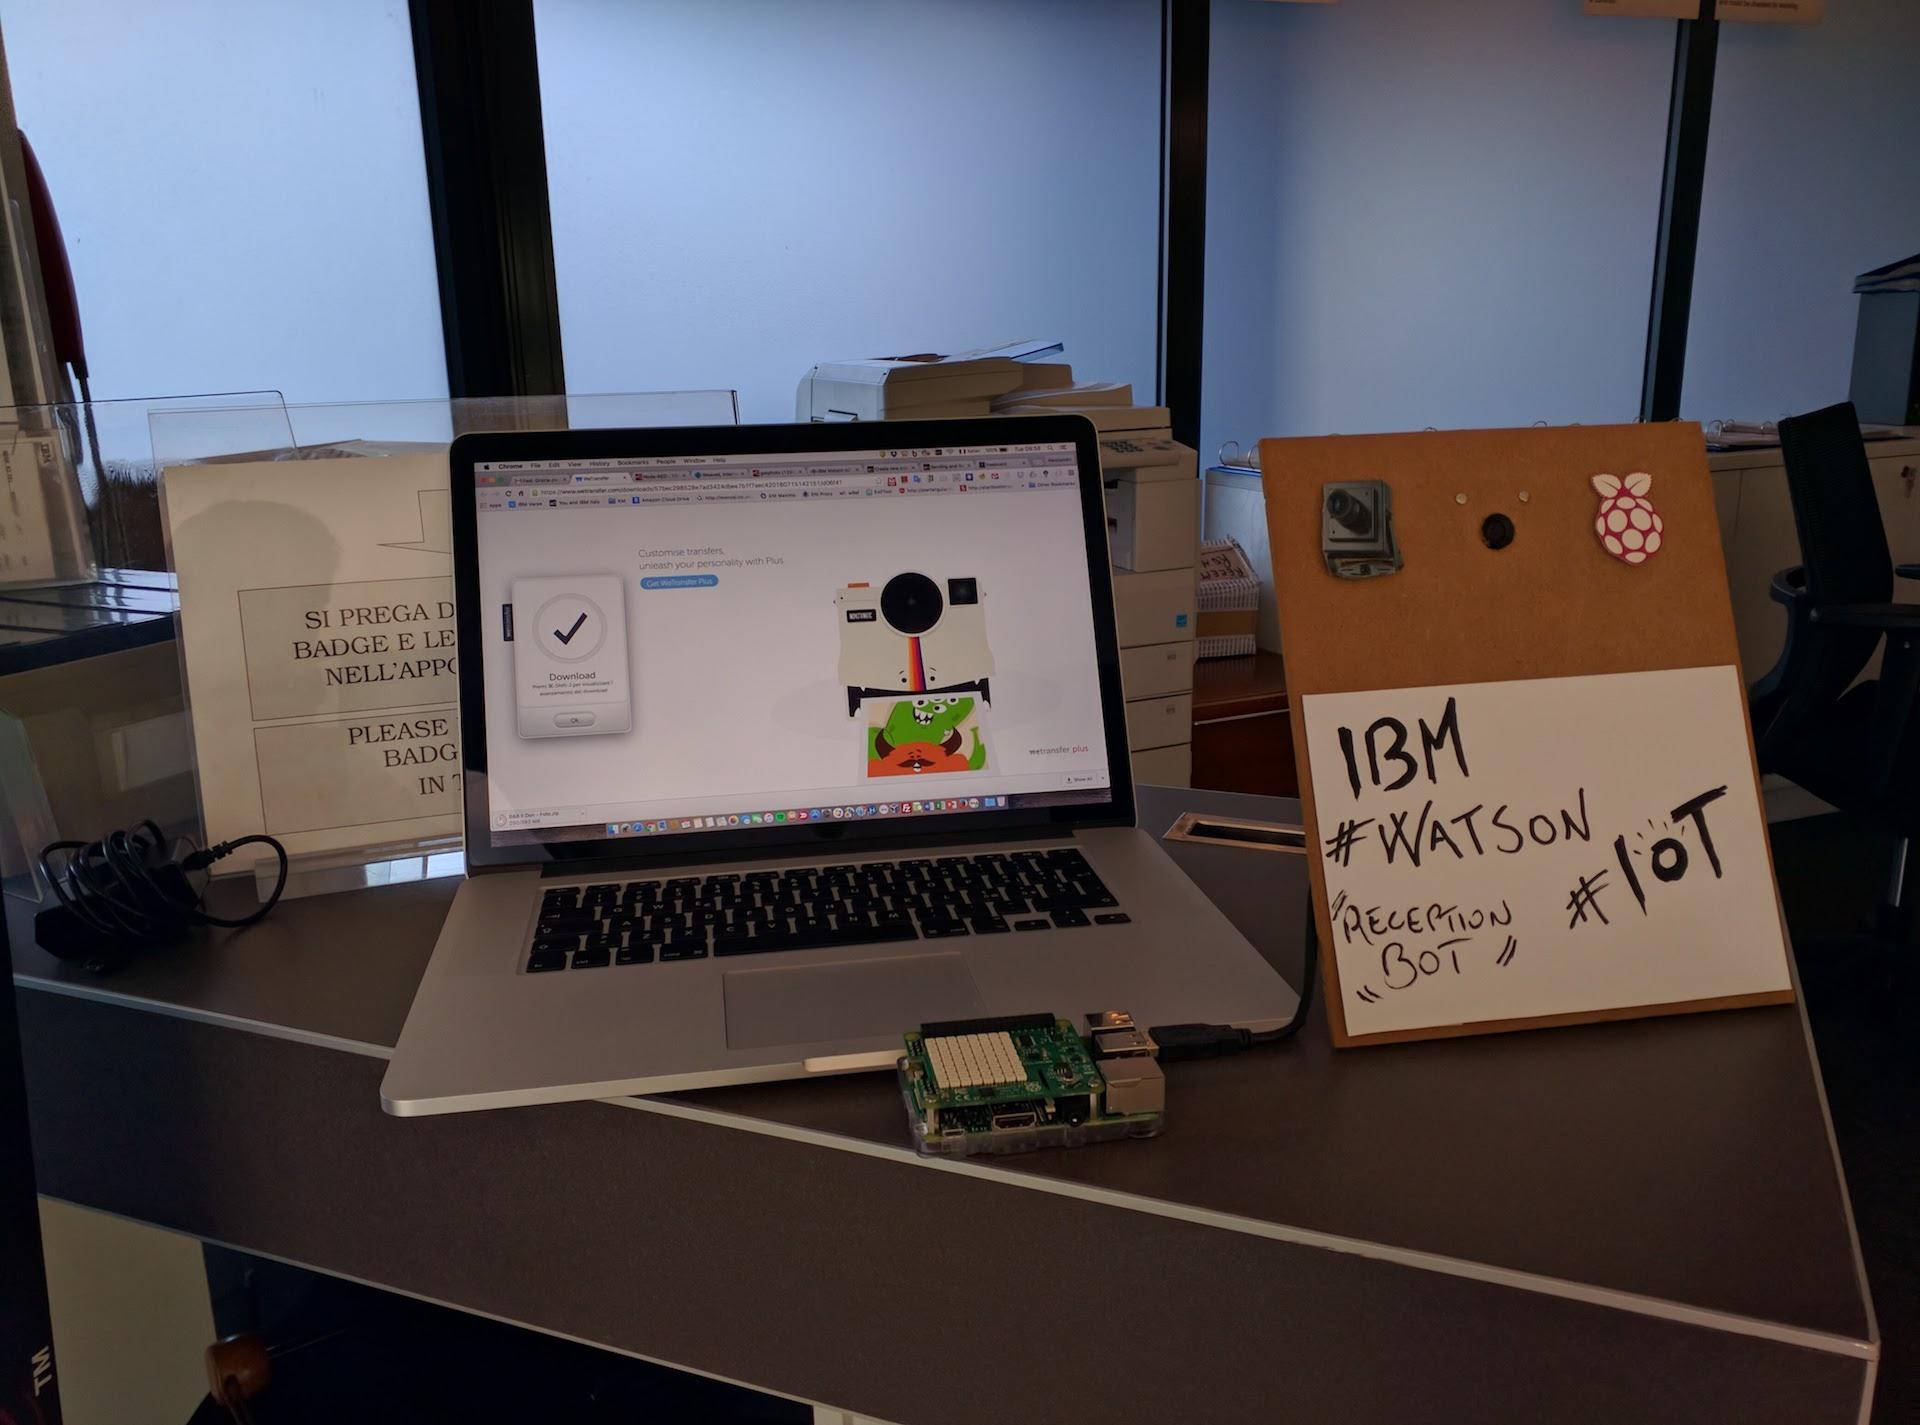 Watson IoT Receptionist BOT in action